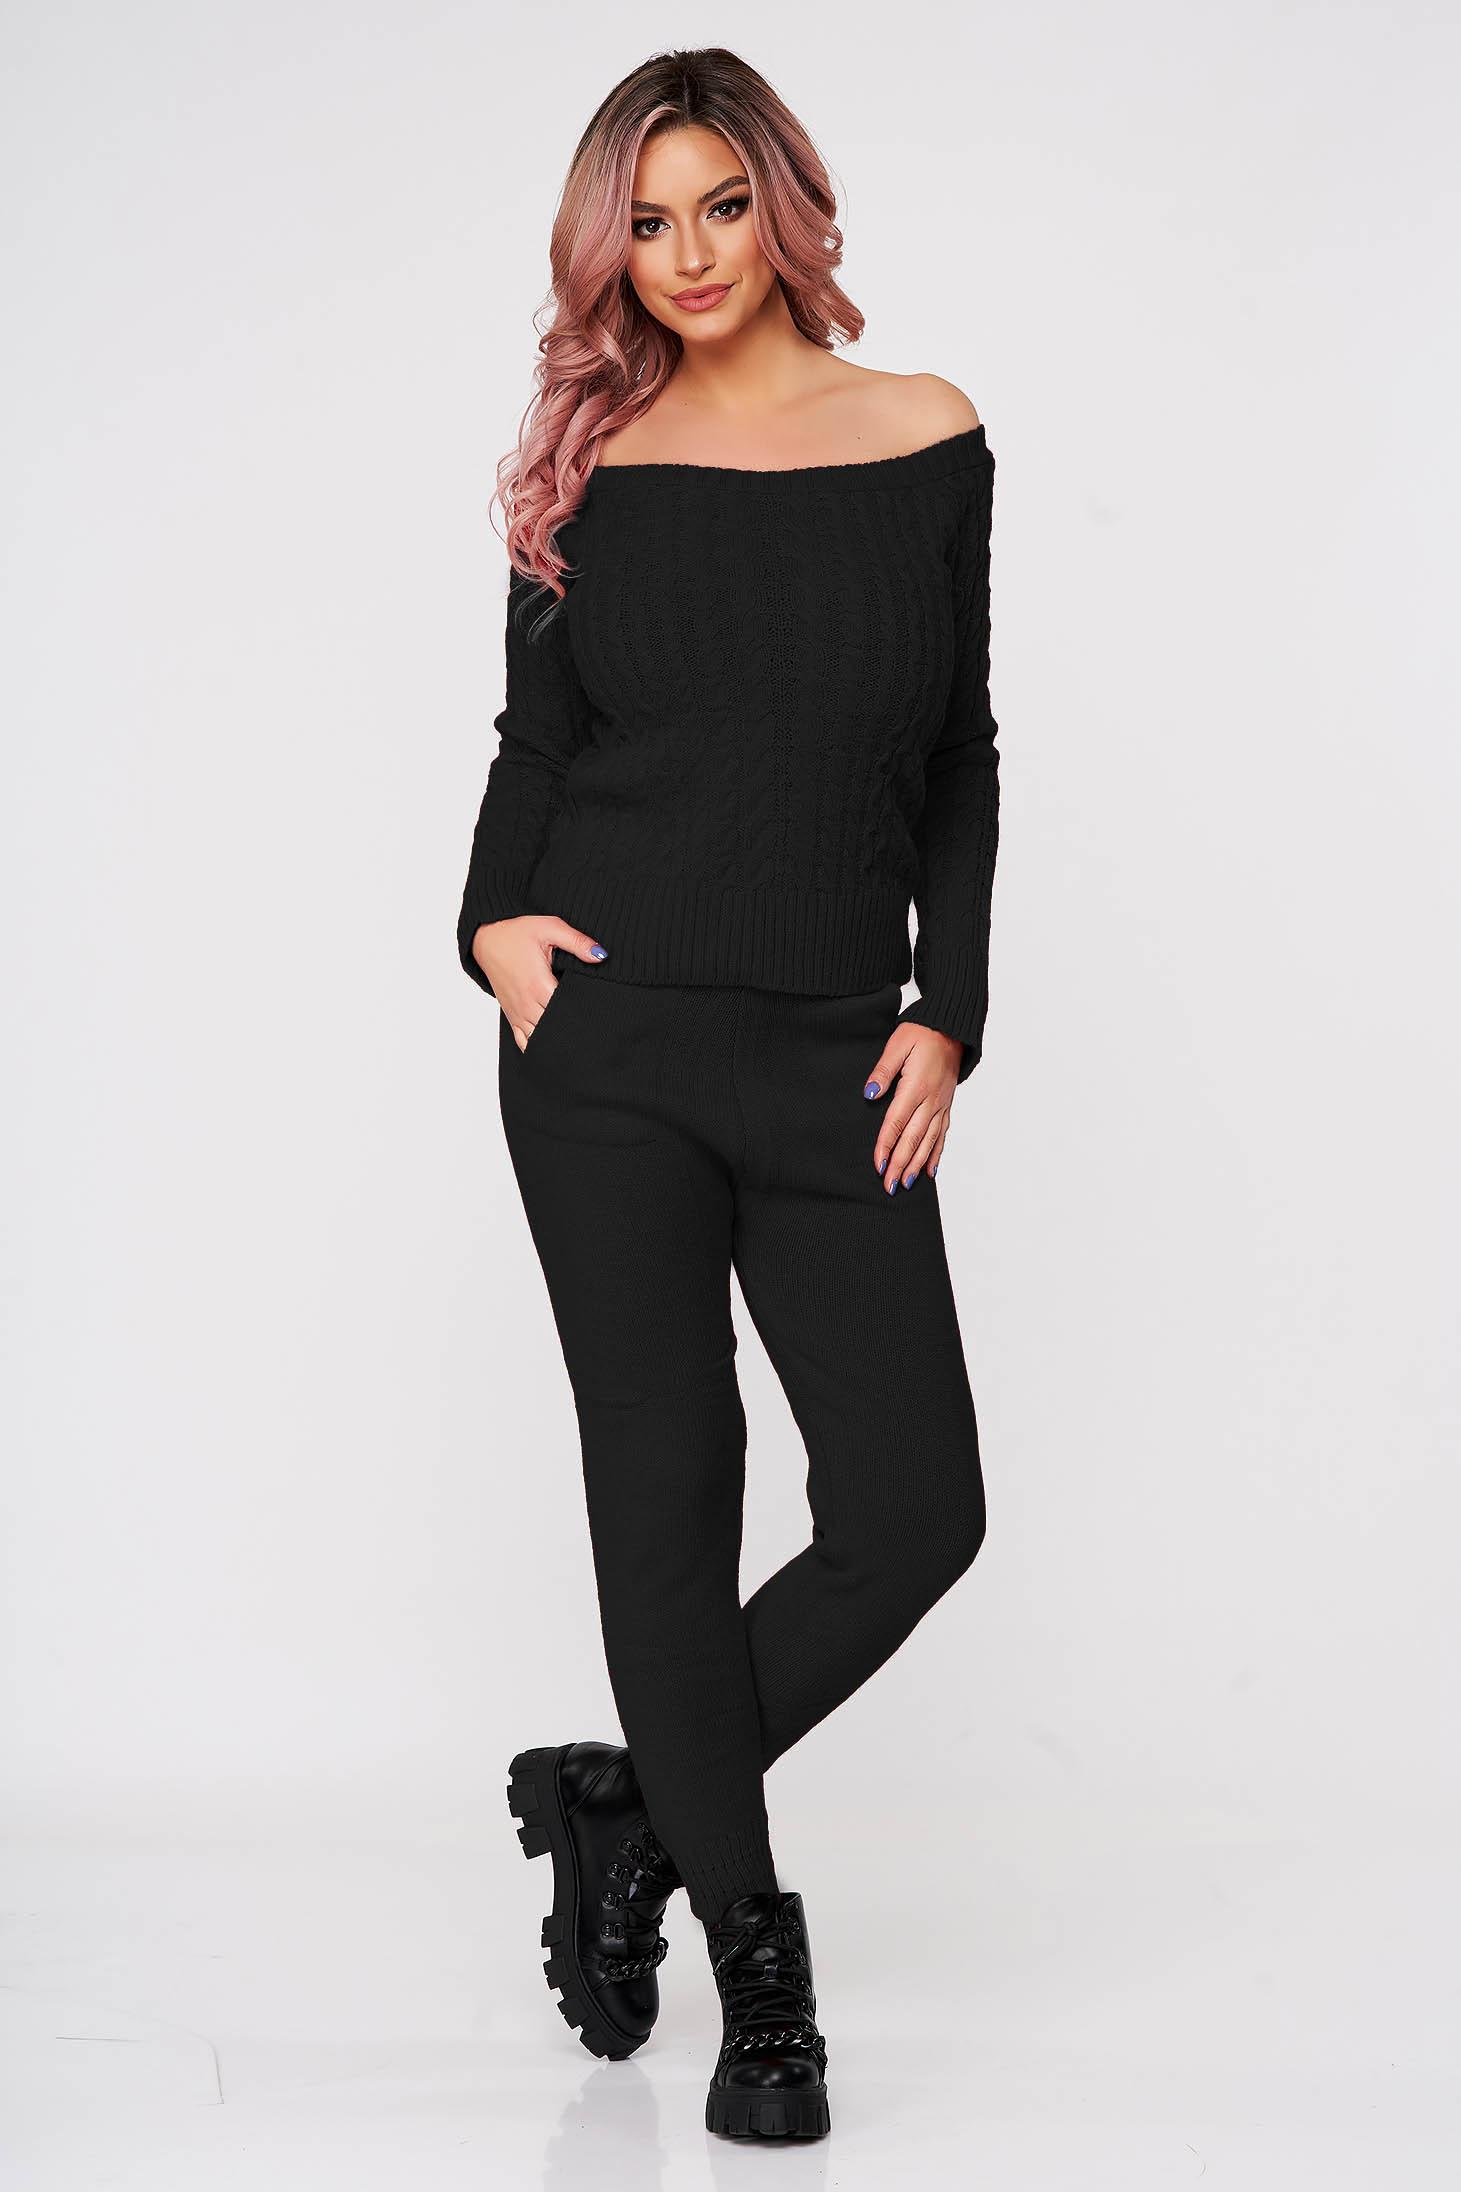 Trening dama SunShine negru casual tricotat cu material impletit din doua piese